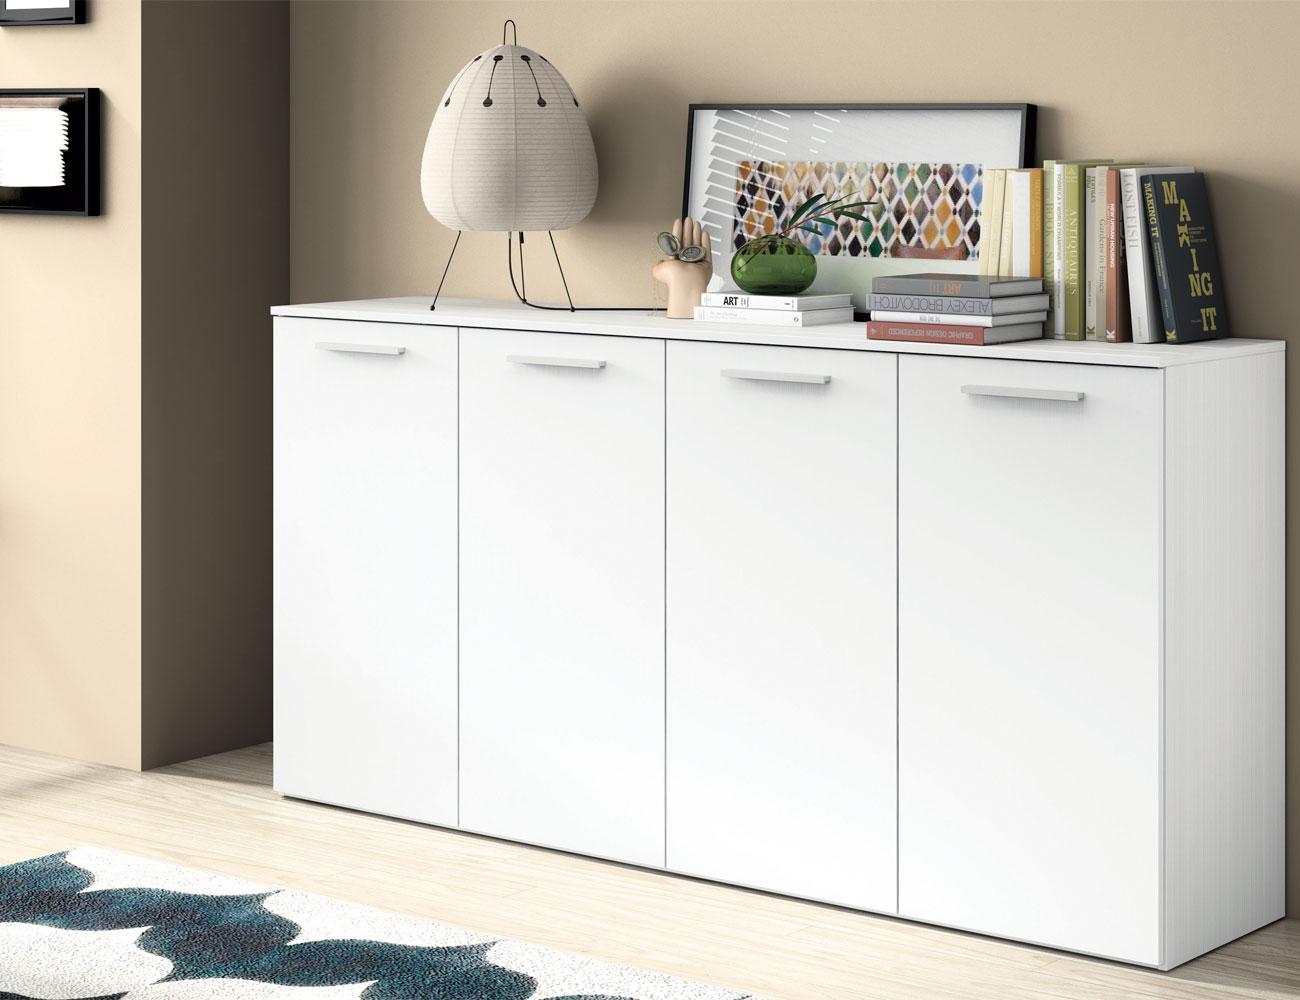 Mueble salon moderno aparador blanco 4144